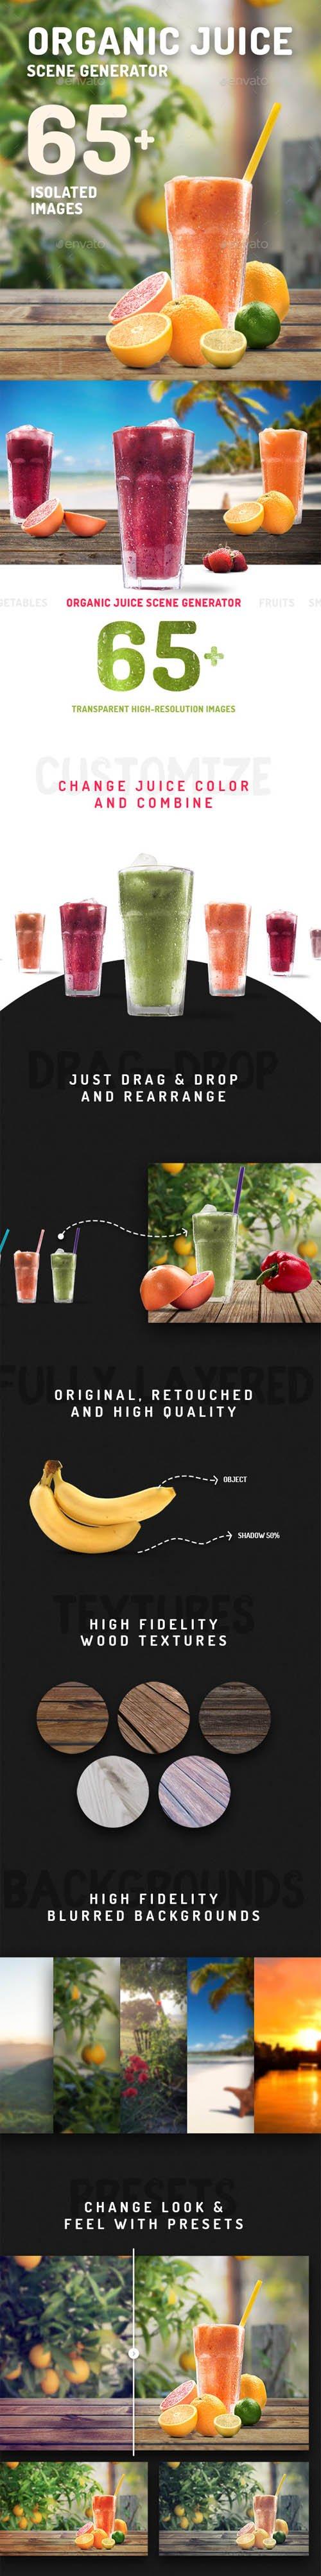 Organic Juice Mockup & Hero Image Scene Generator 19731811